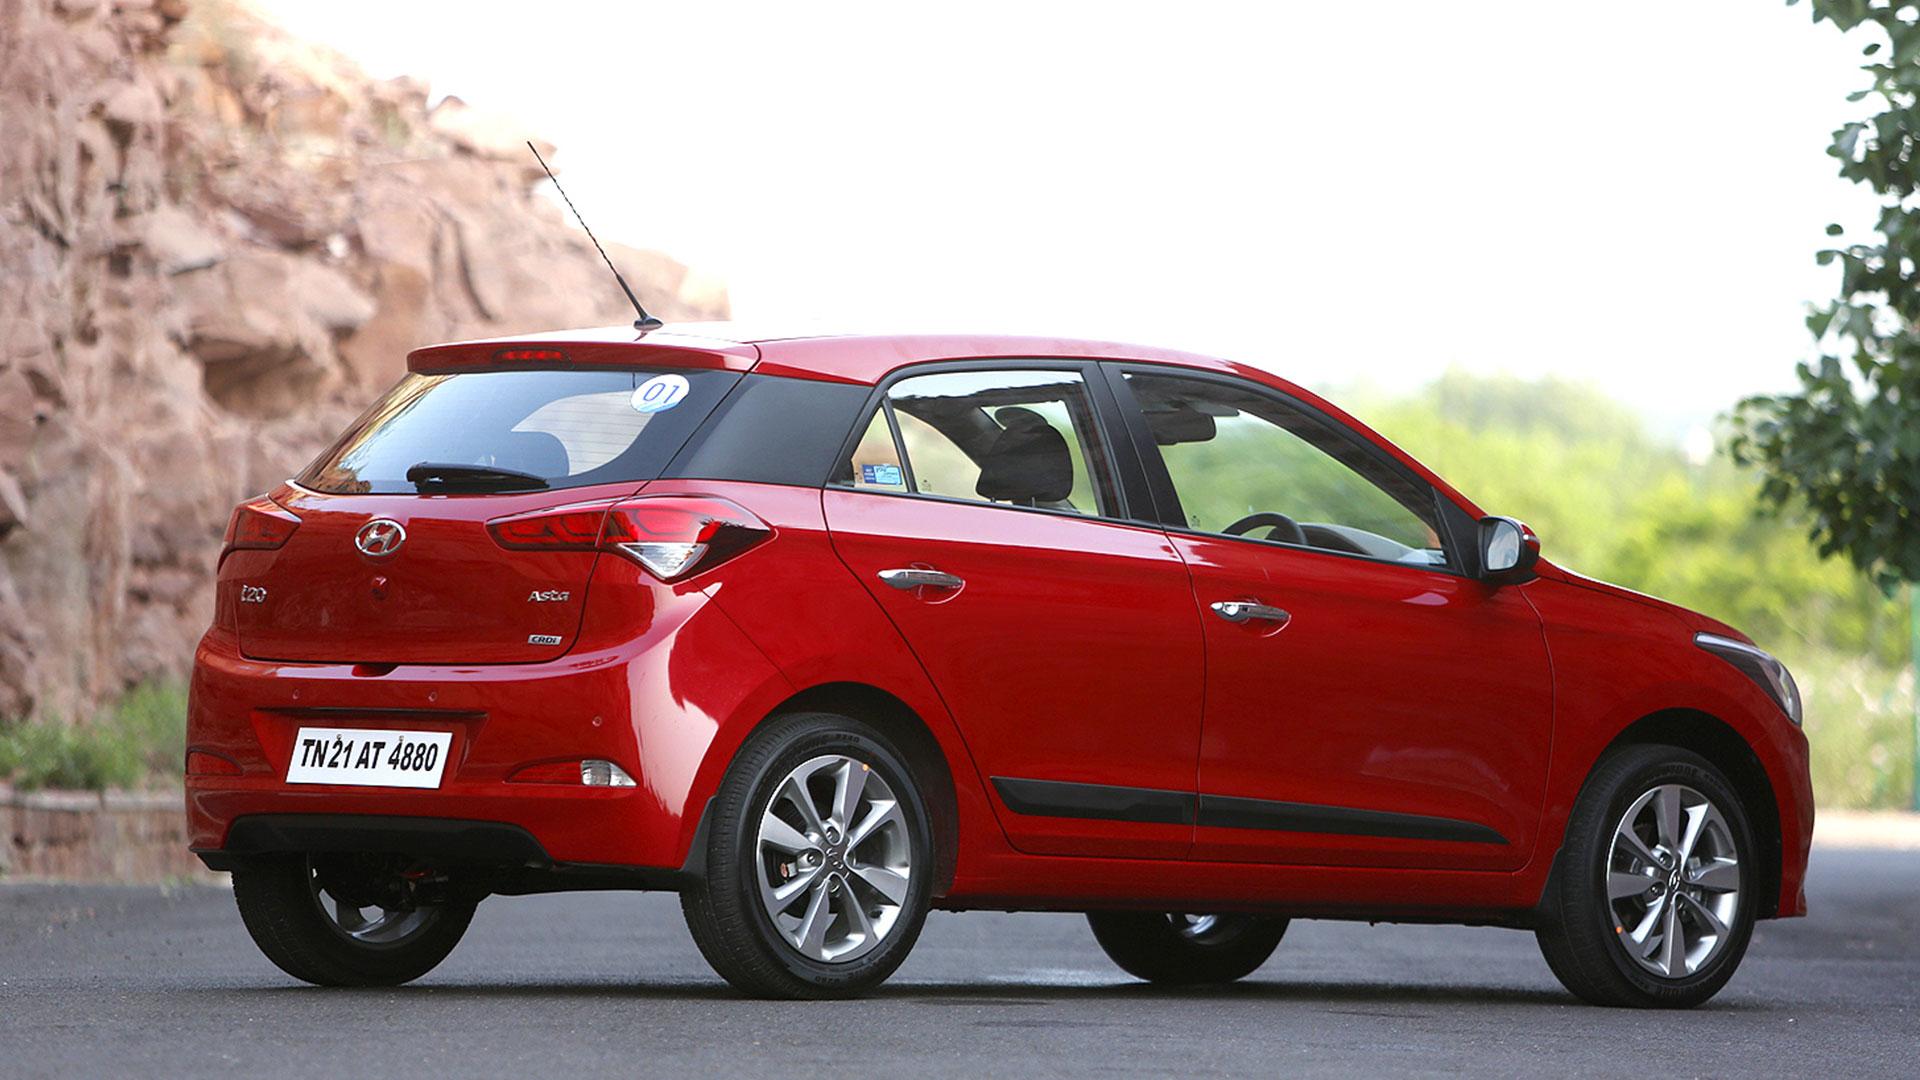 Hyundai-Elite-i20-2014 Compare